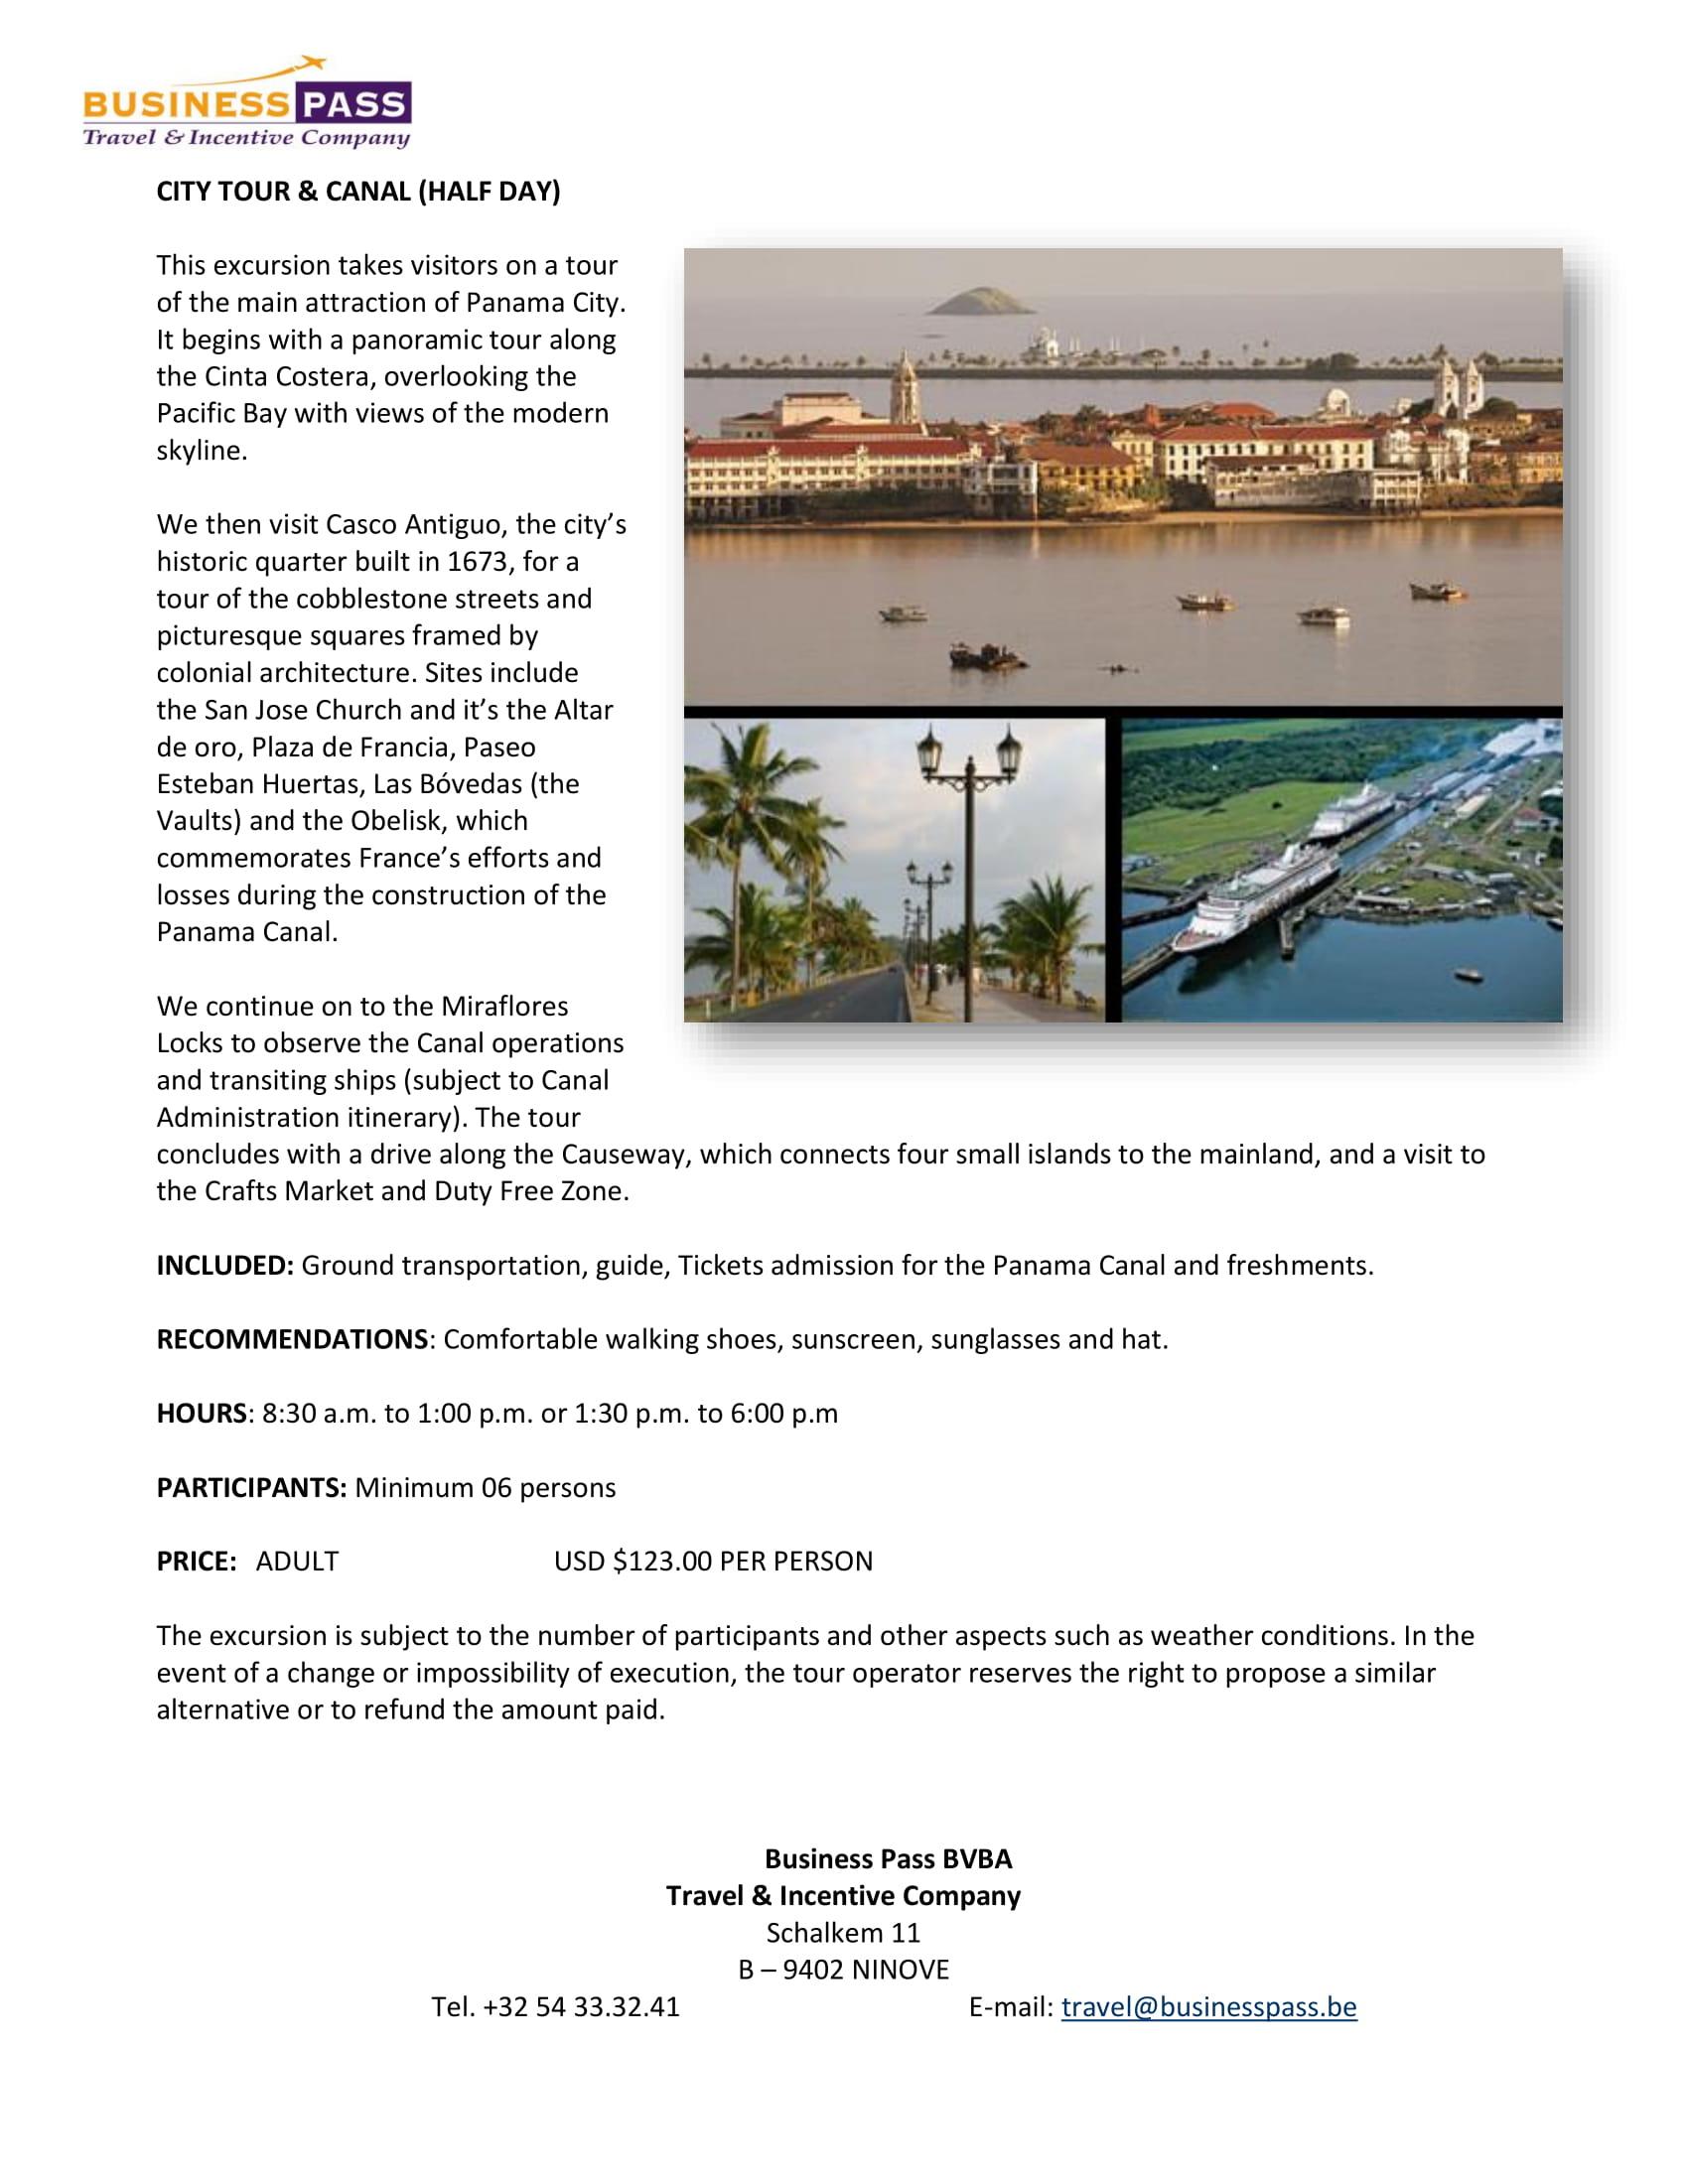 GLA_Borchure_of_Optional_Excursions_Panama_2019_003_1-01